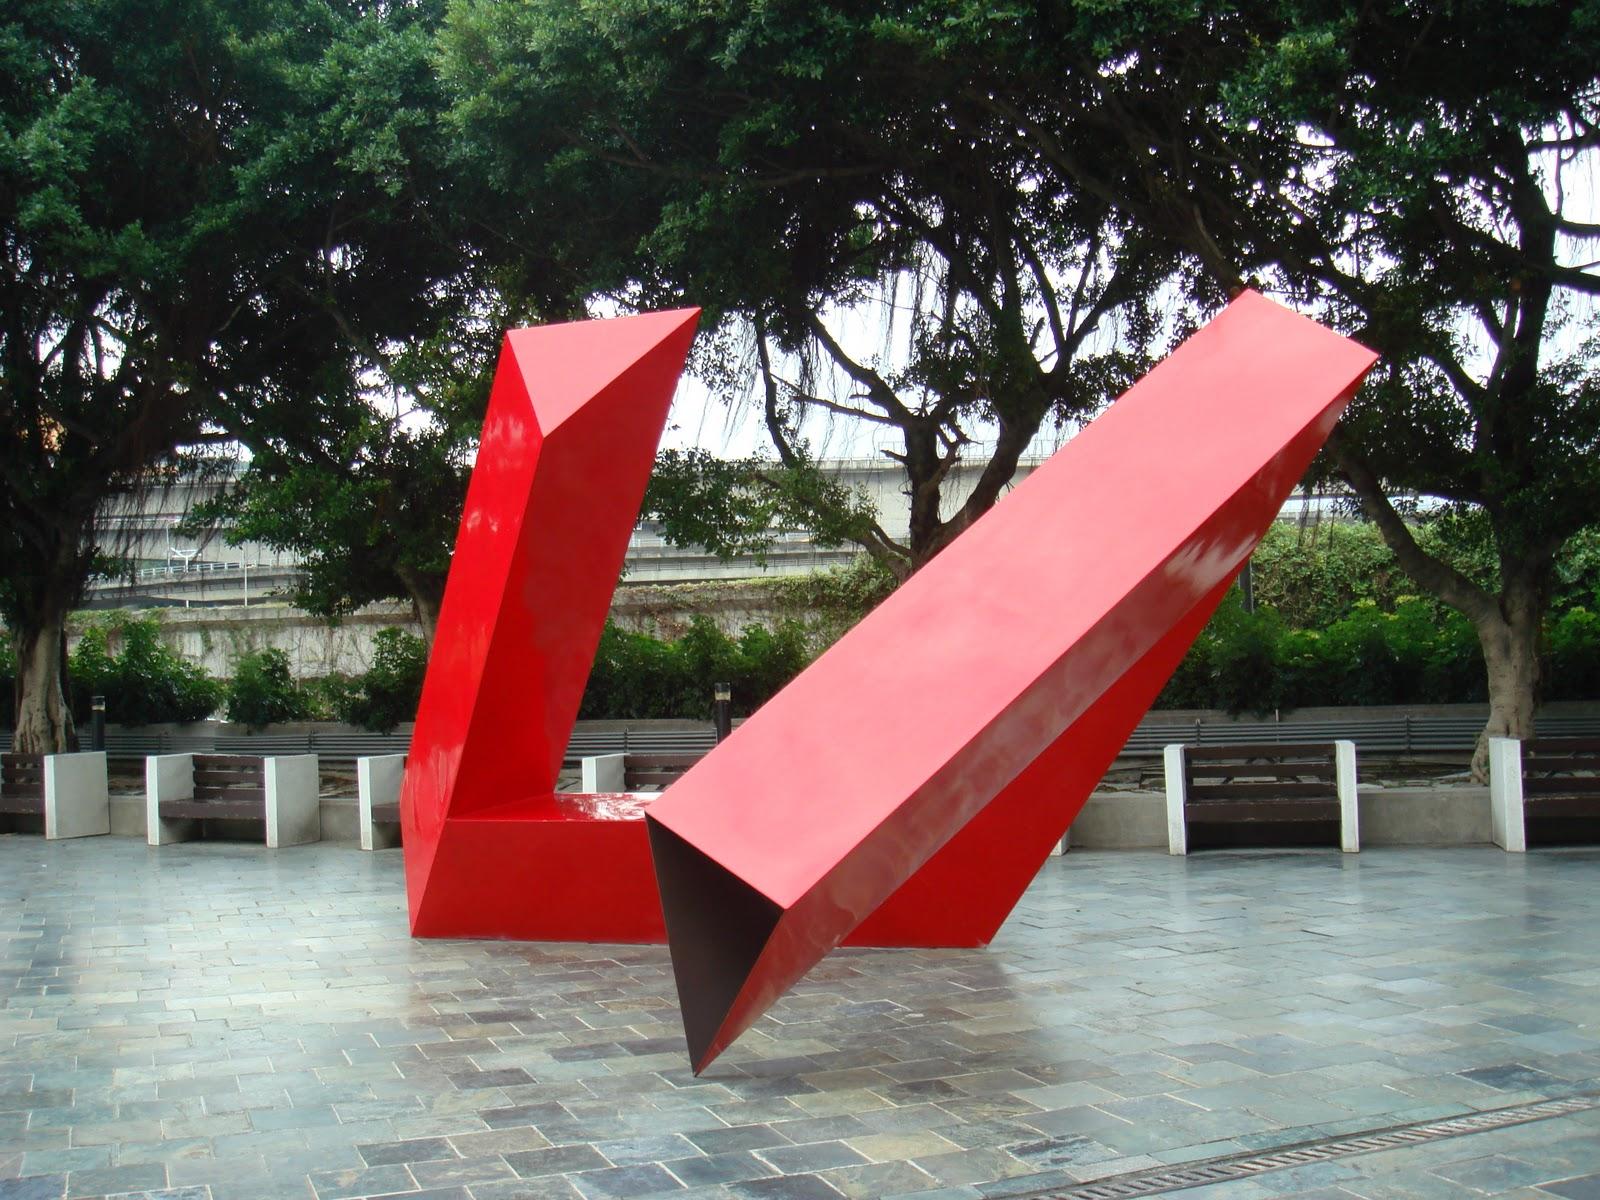 近い過去・近い未來: 臺北市立美術館 中華民國臺灣